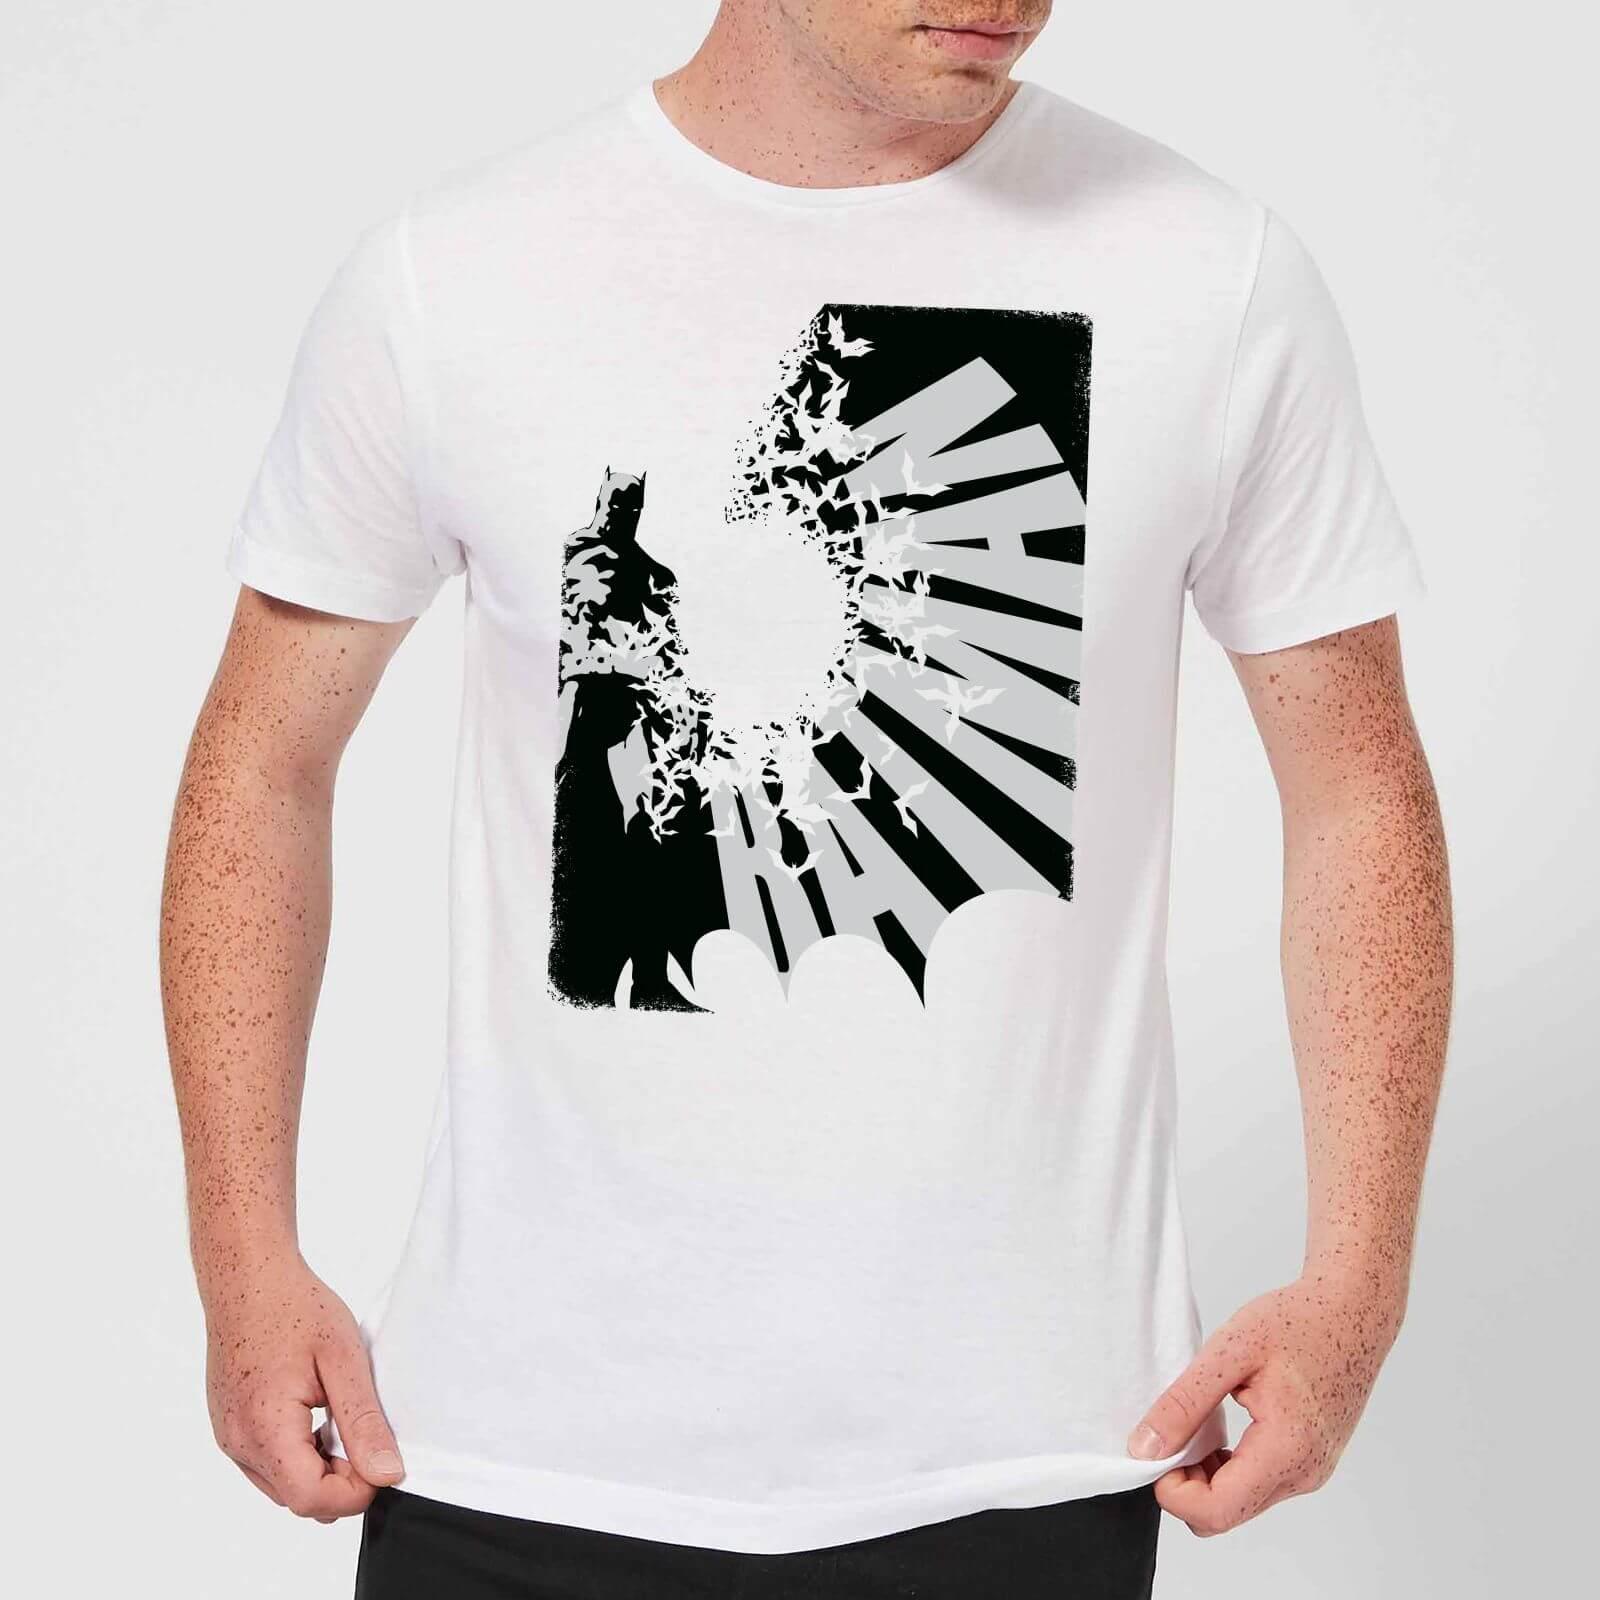 4f8d8e1cd4e4 DC Comics Batman Bat Spread T-Shirt - White Clothing